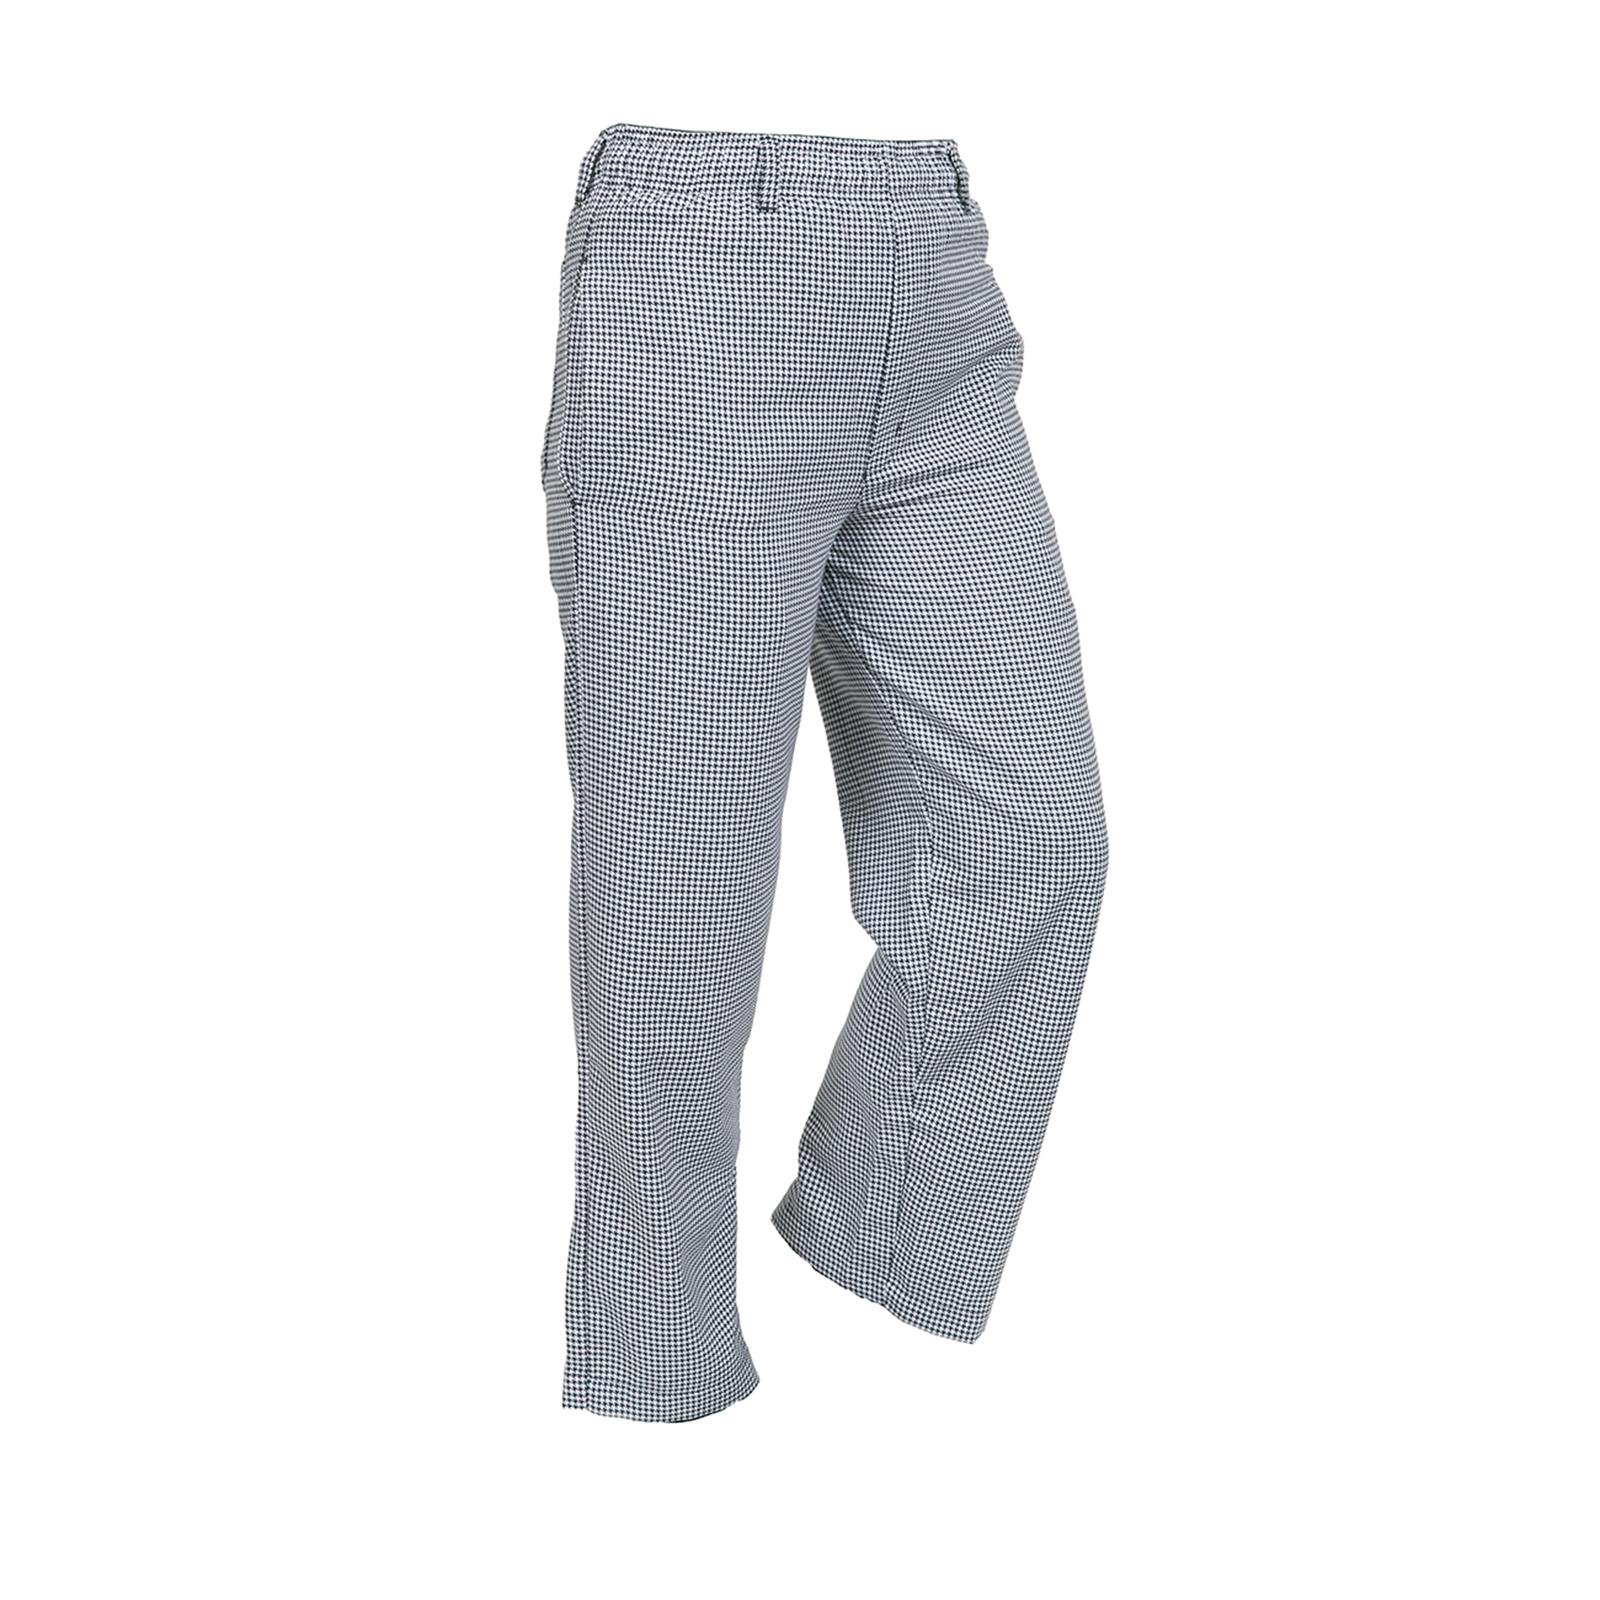 Mercer Culinary M60030HT4X chef's pants